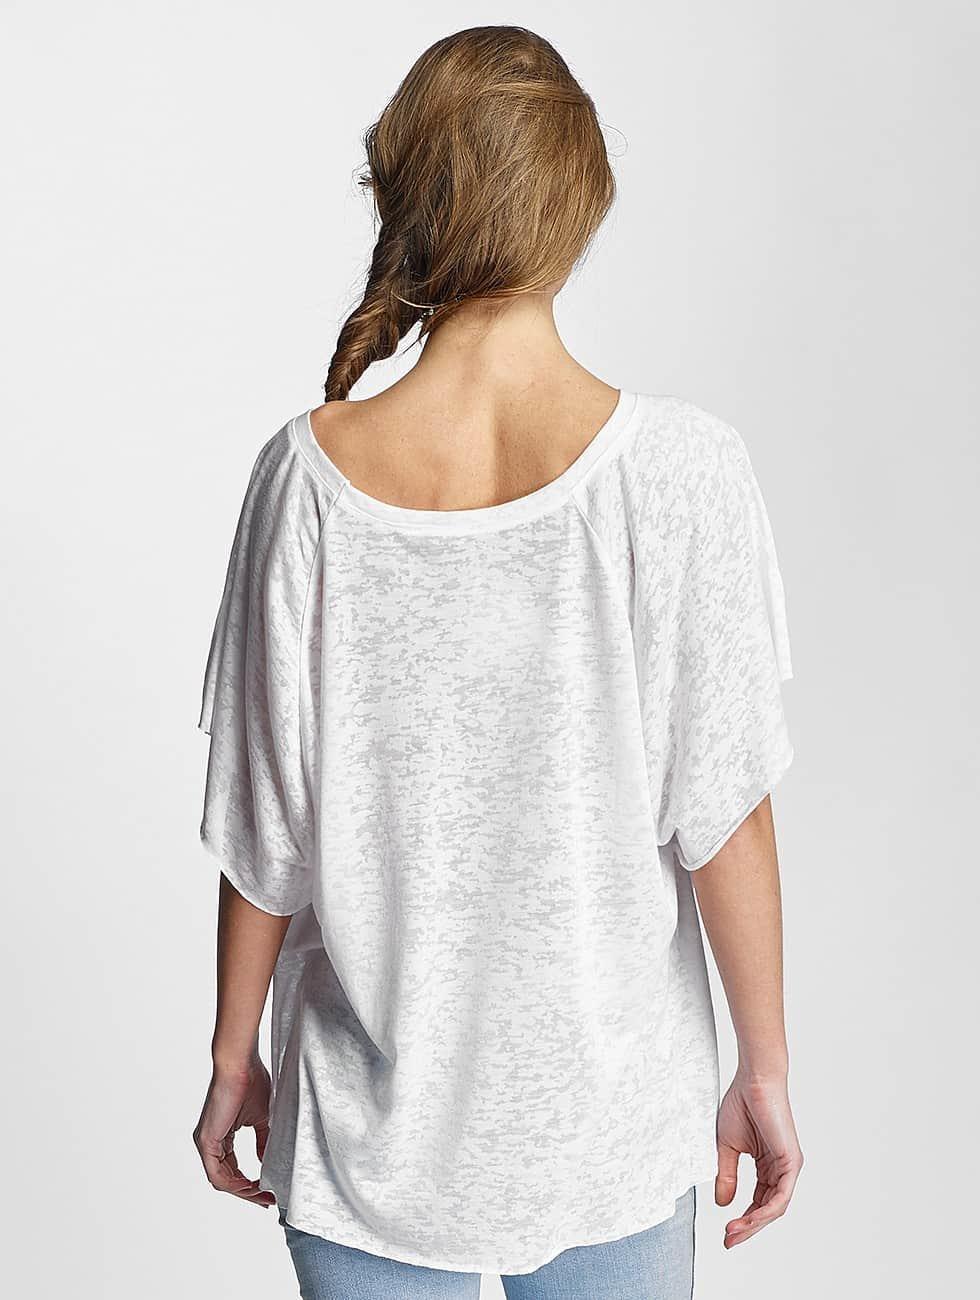 Poolgirl T-Shirt Salome white